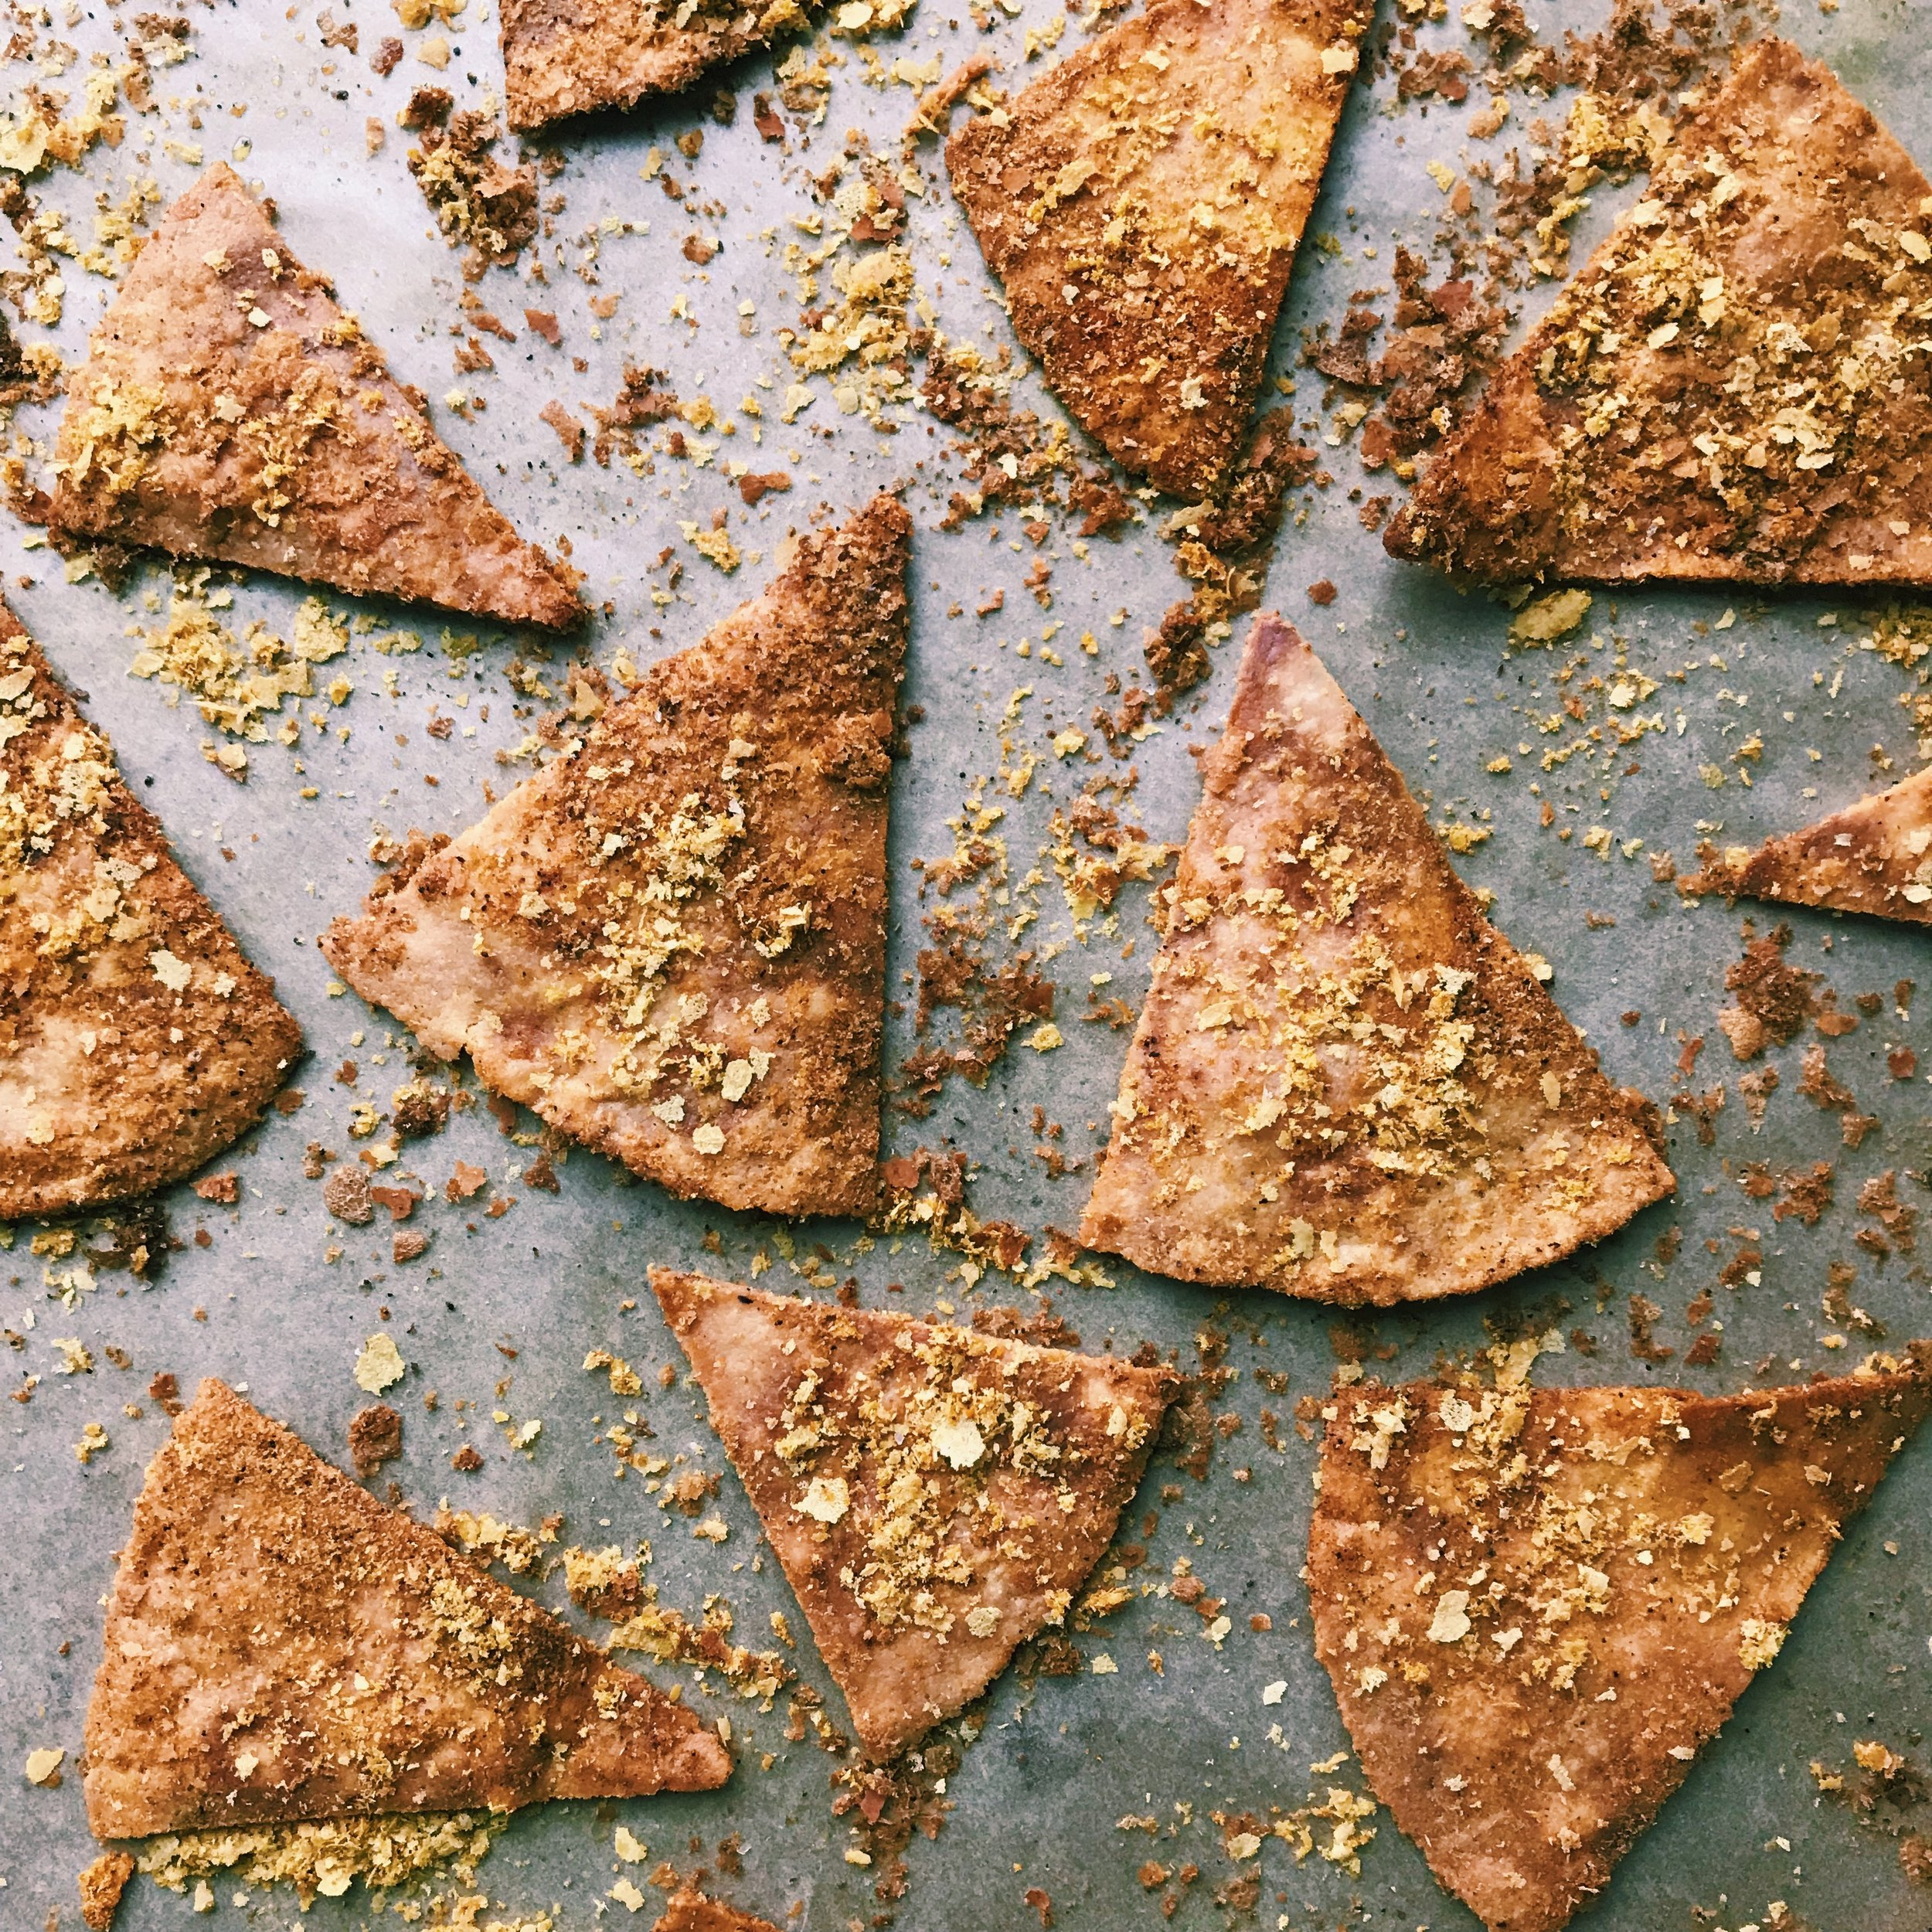 homemade_nachos.JPG